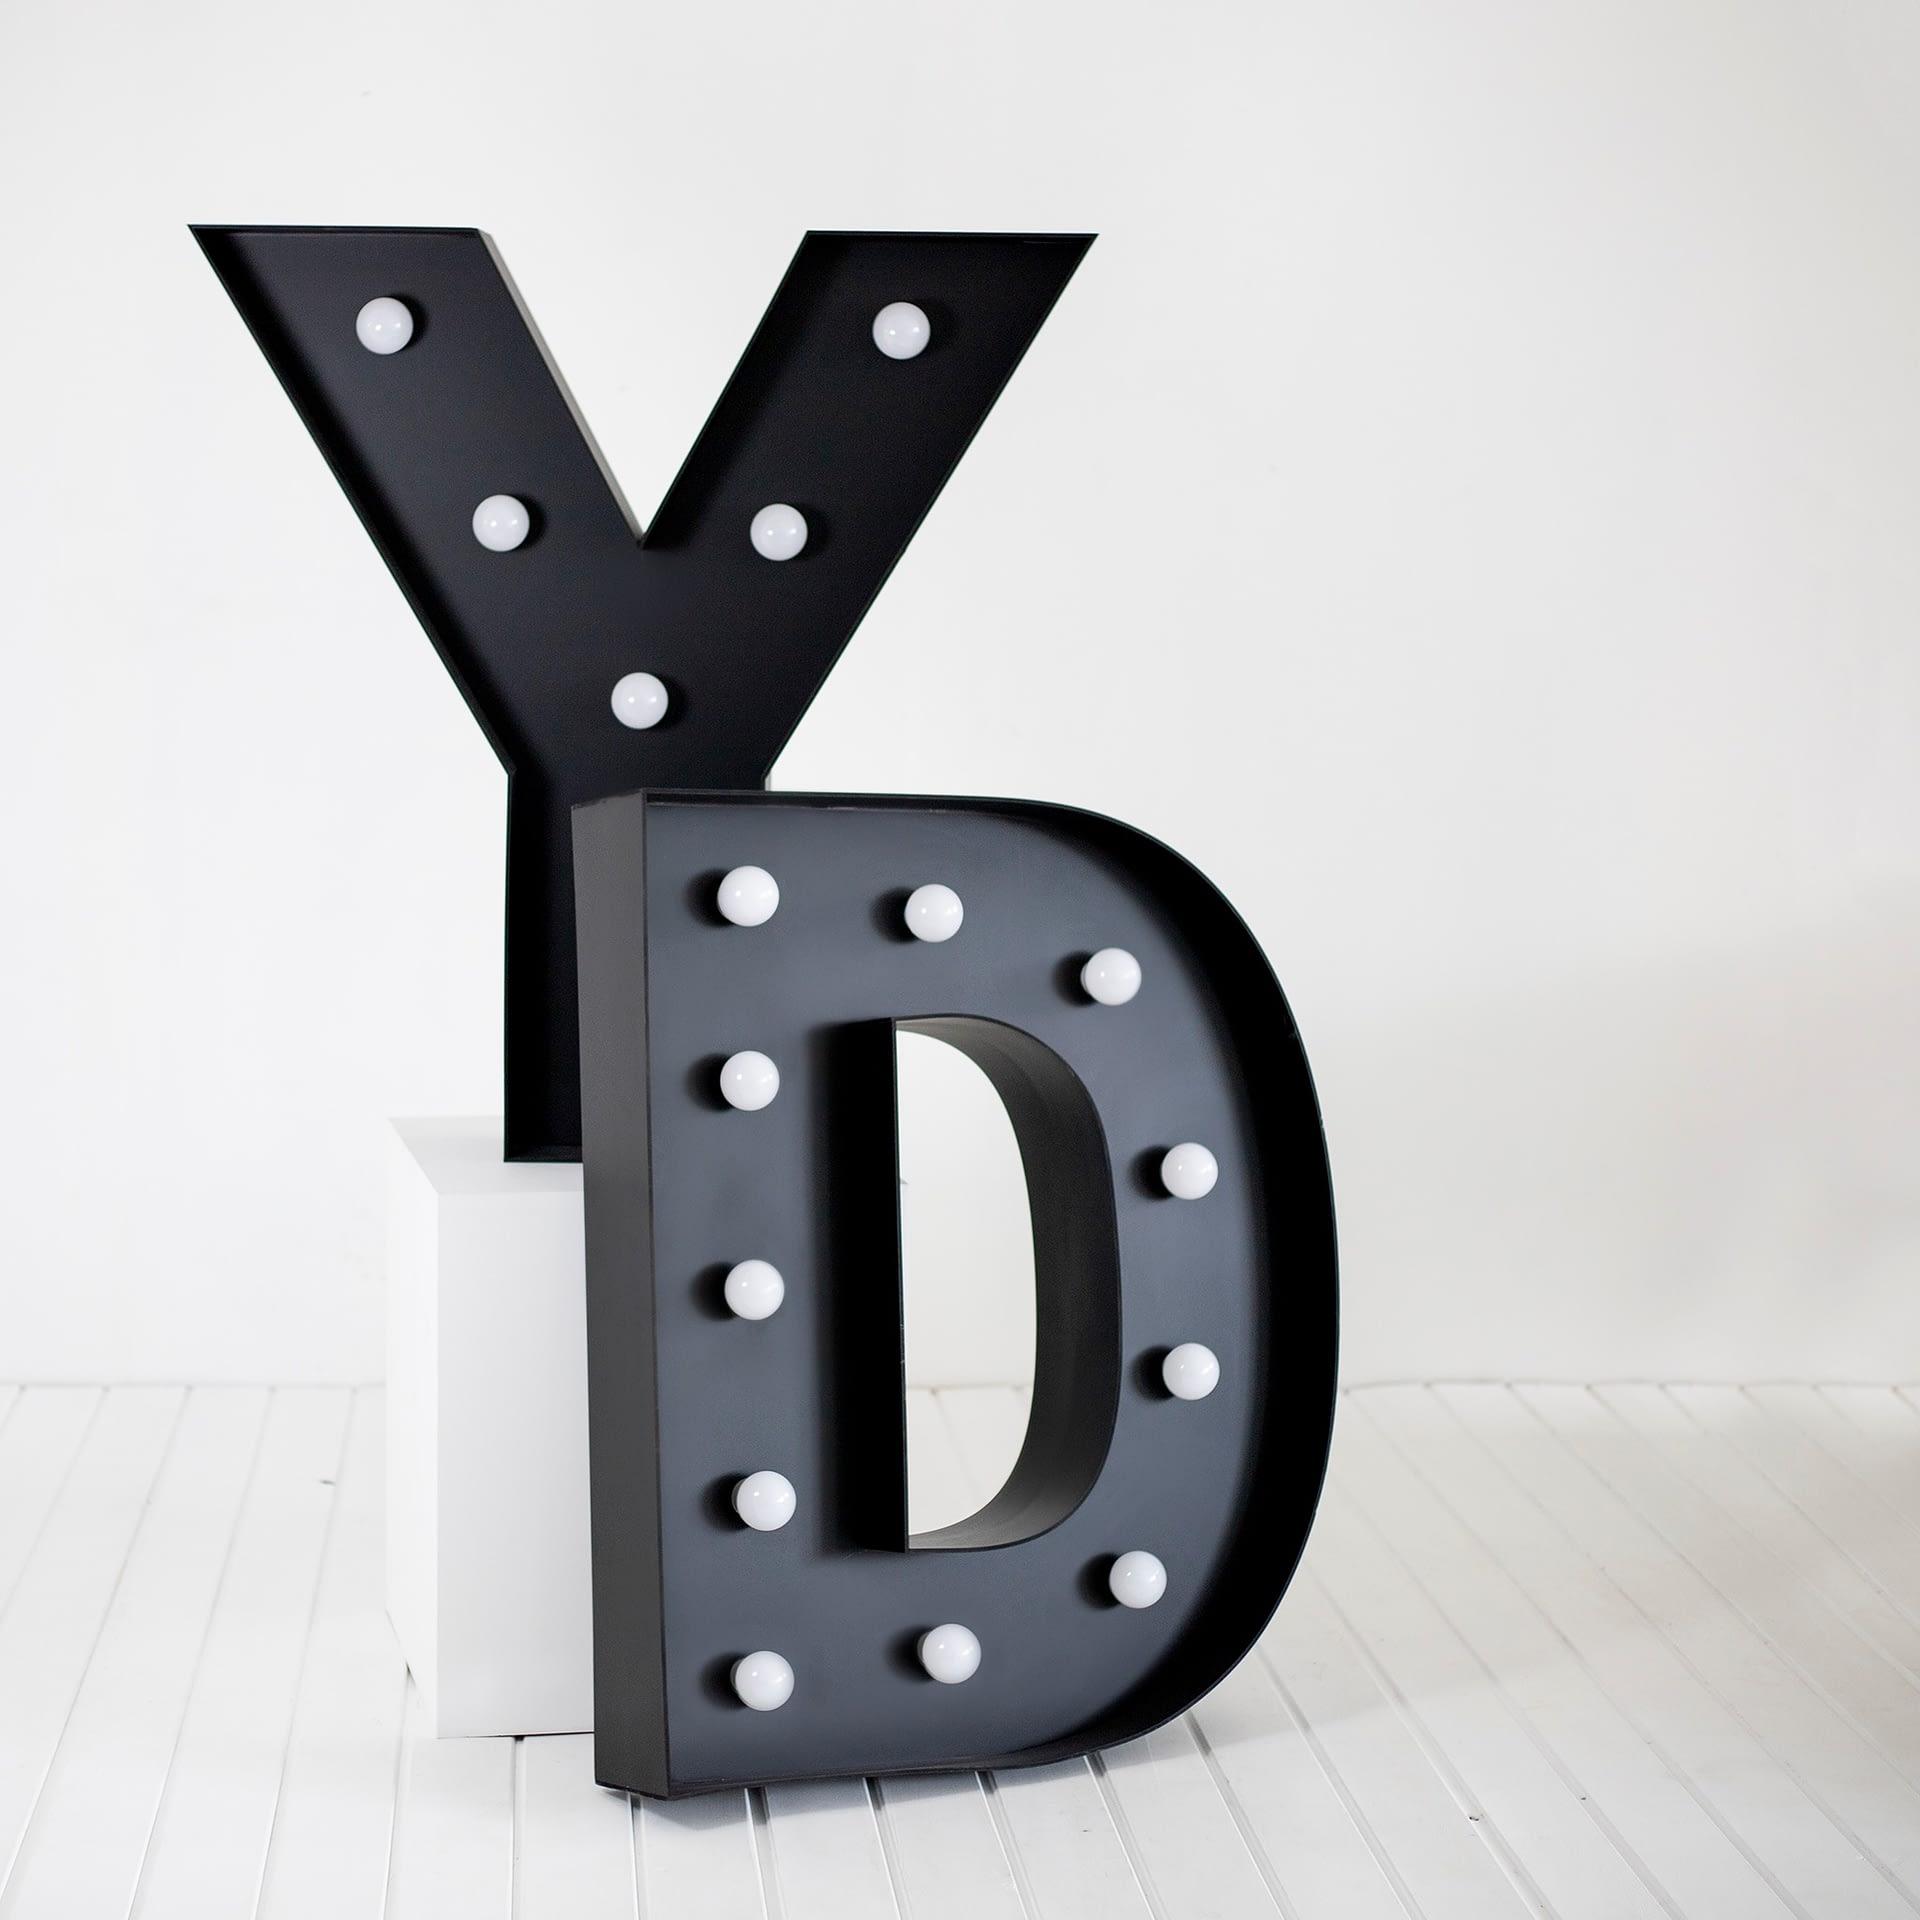 litery 3d z żarówkami